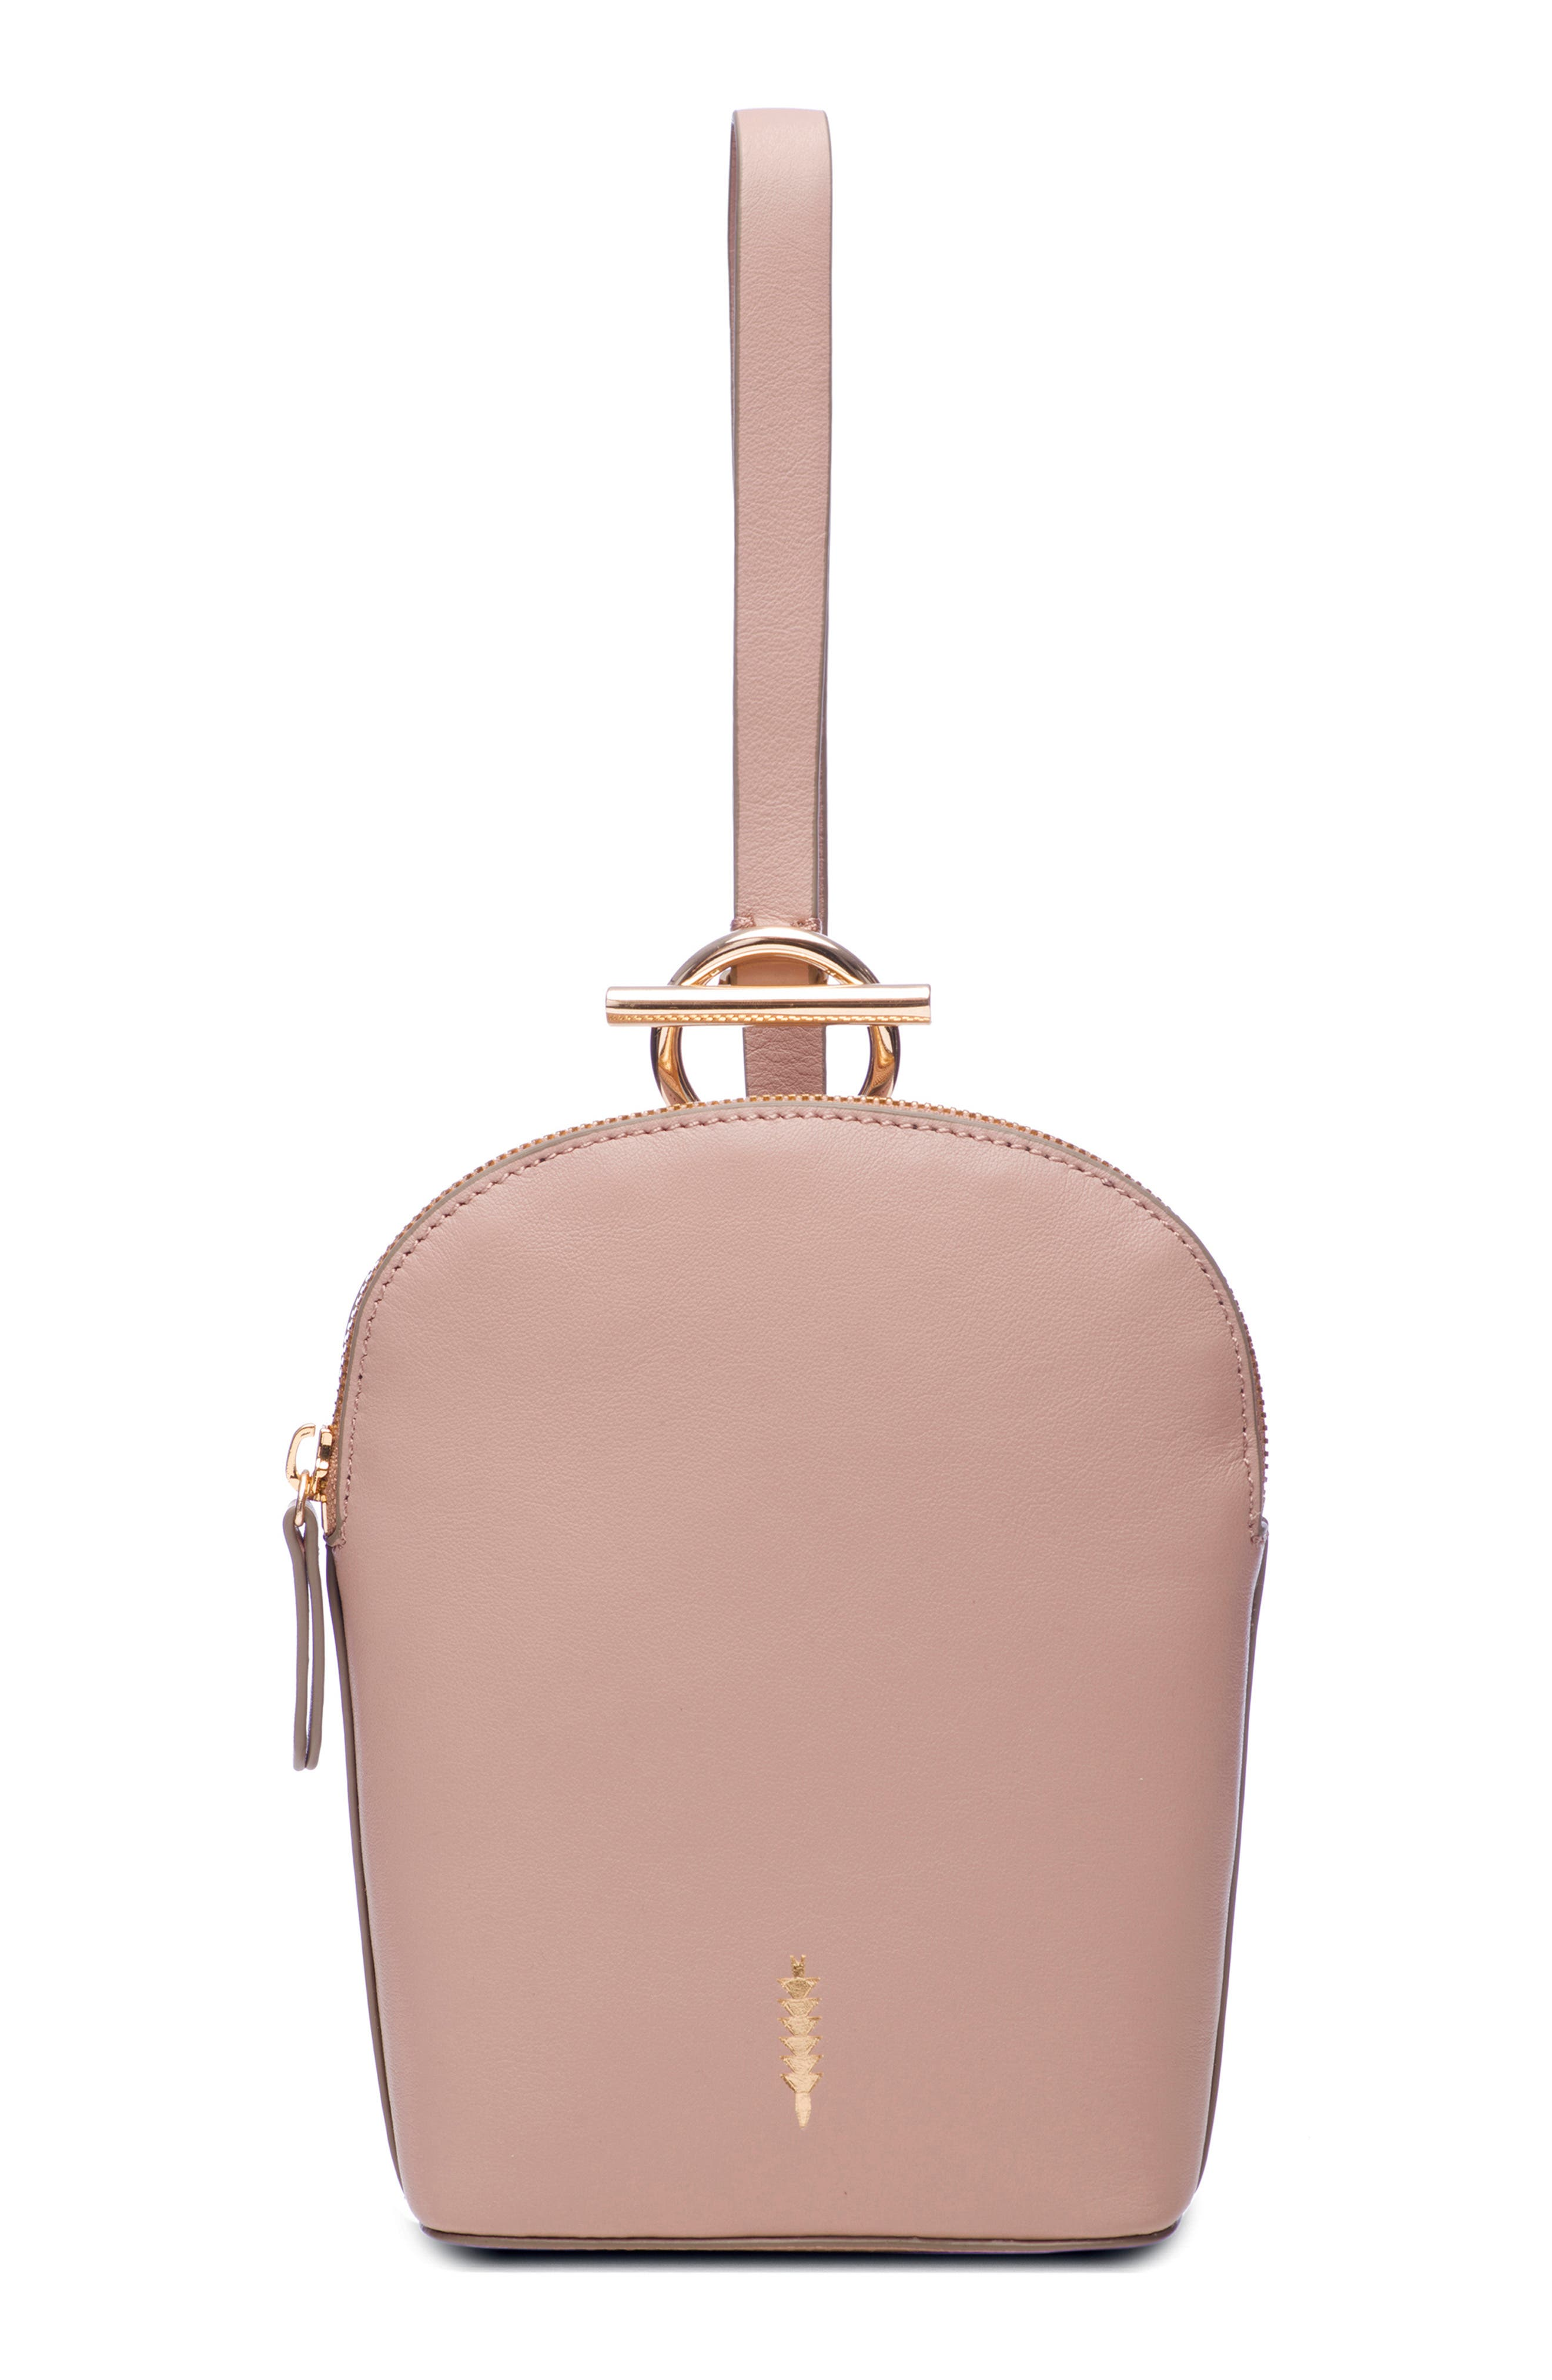 Thacker Ava Leather Wristlet - Pink